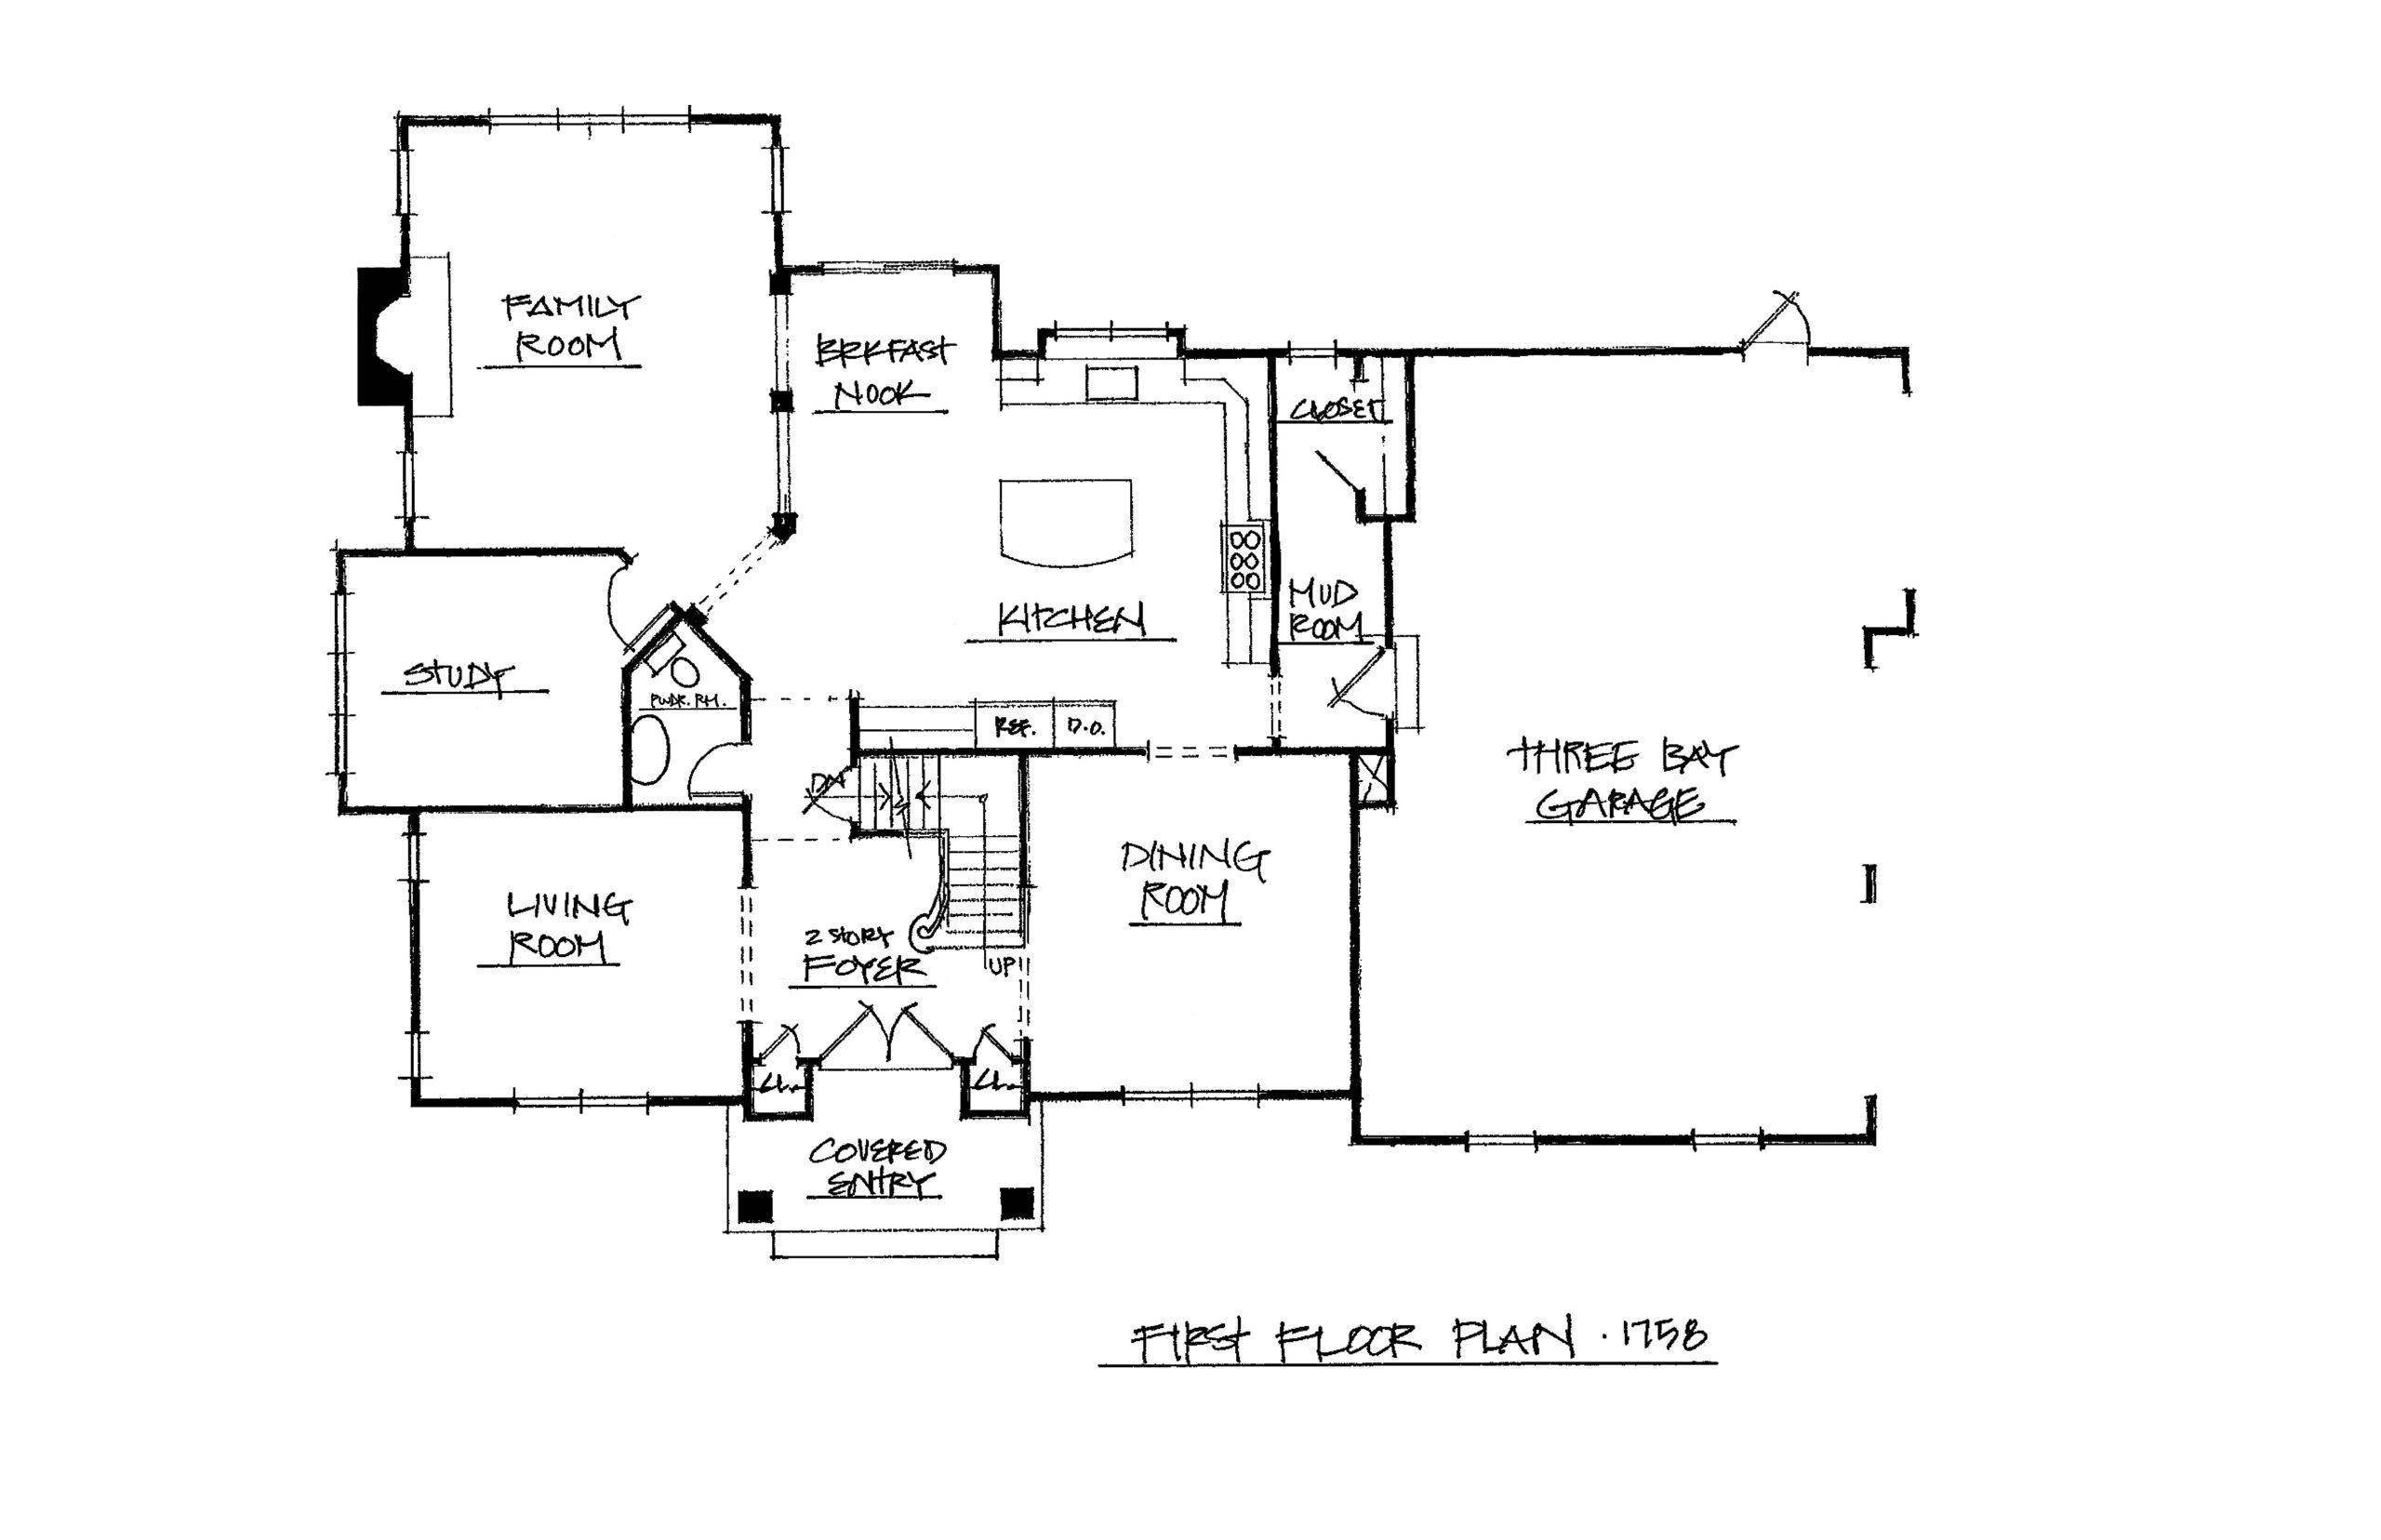 The Derby 3825 Sqft Plan 1st Floor